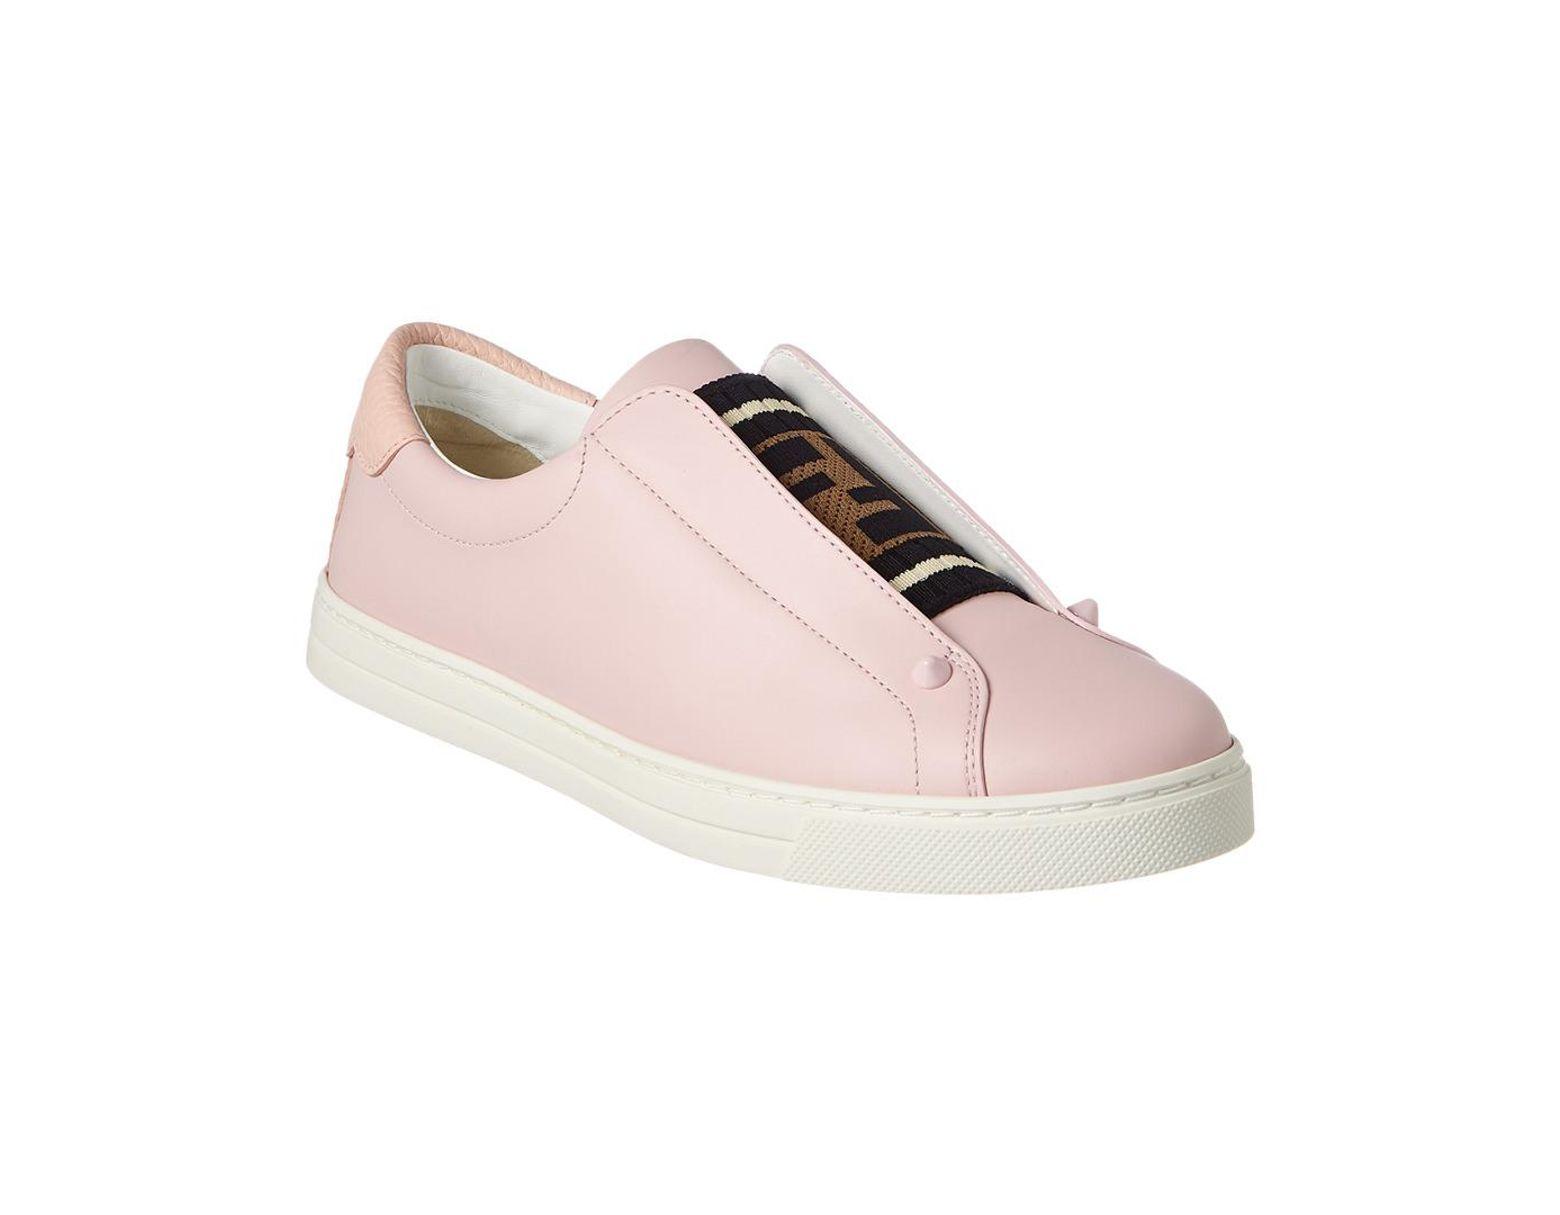 8b34e552 Fendi Slip-on Leather Sneaker in Pink - Save 43% - Lyst